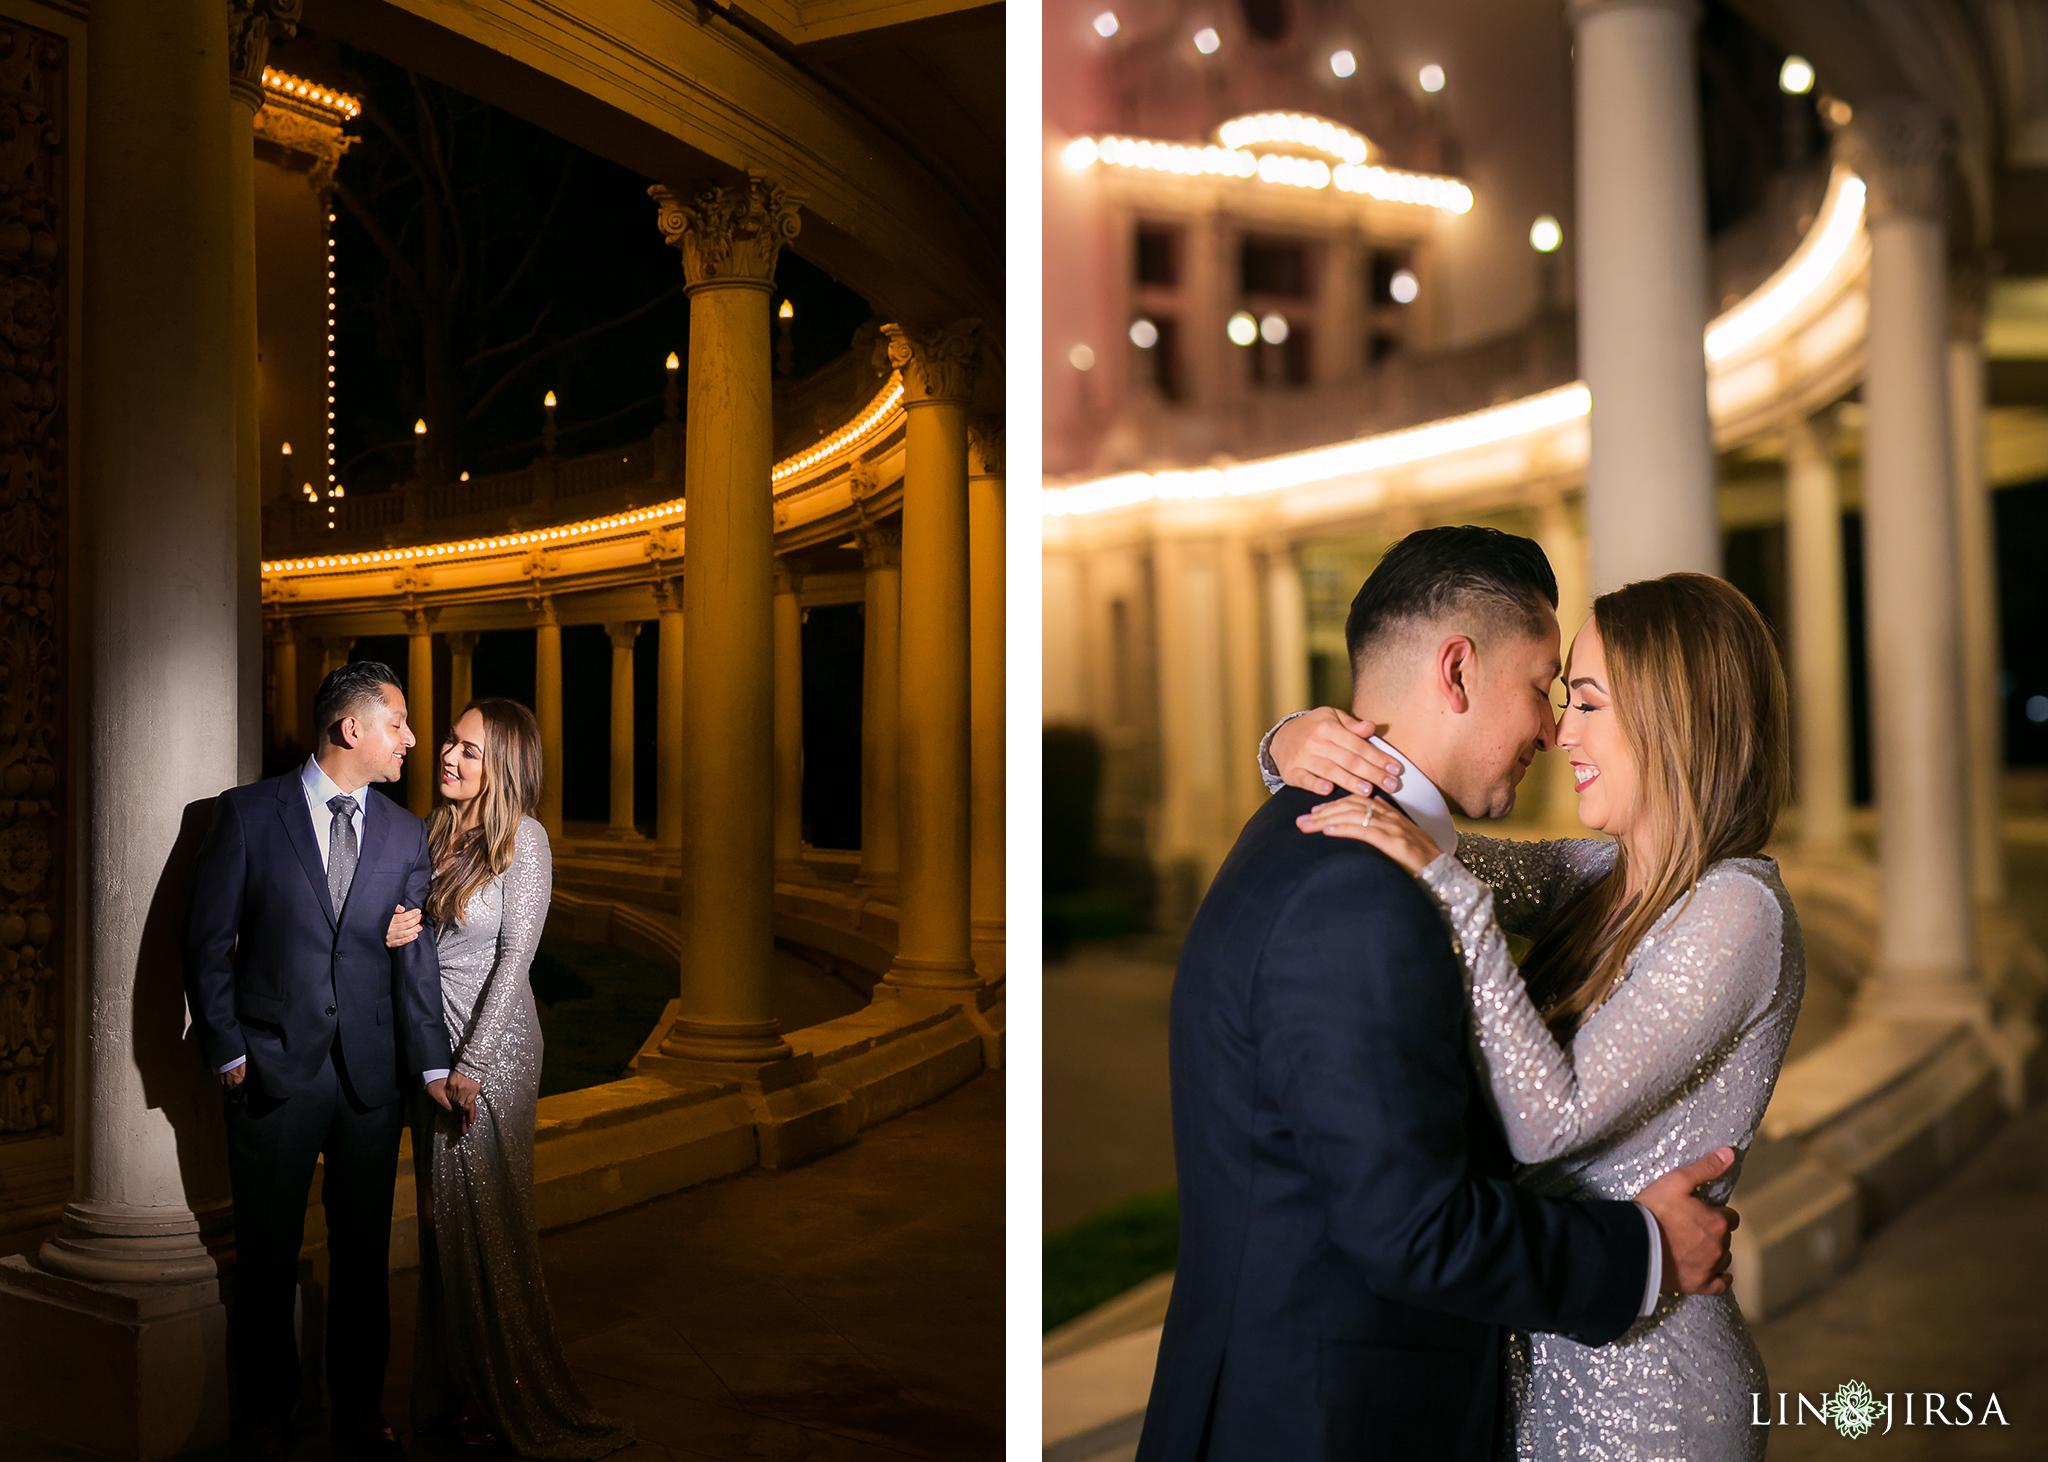 13-balboa-park-san-diego-engagement-photography